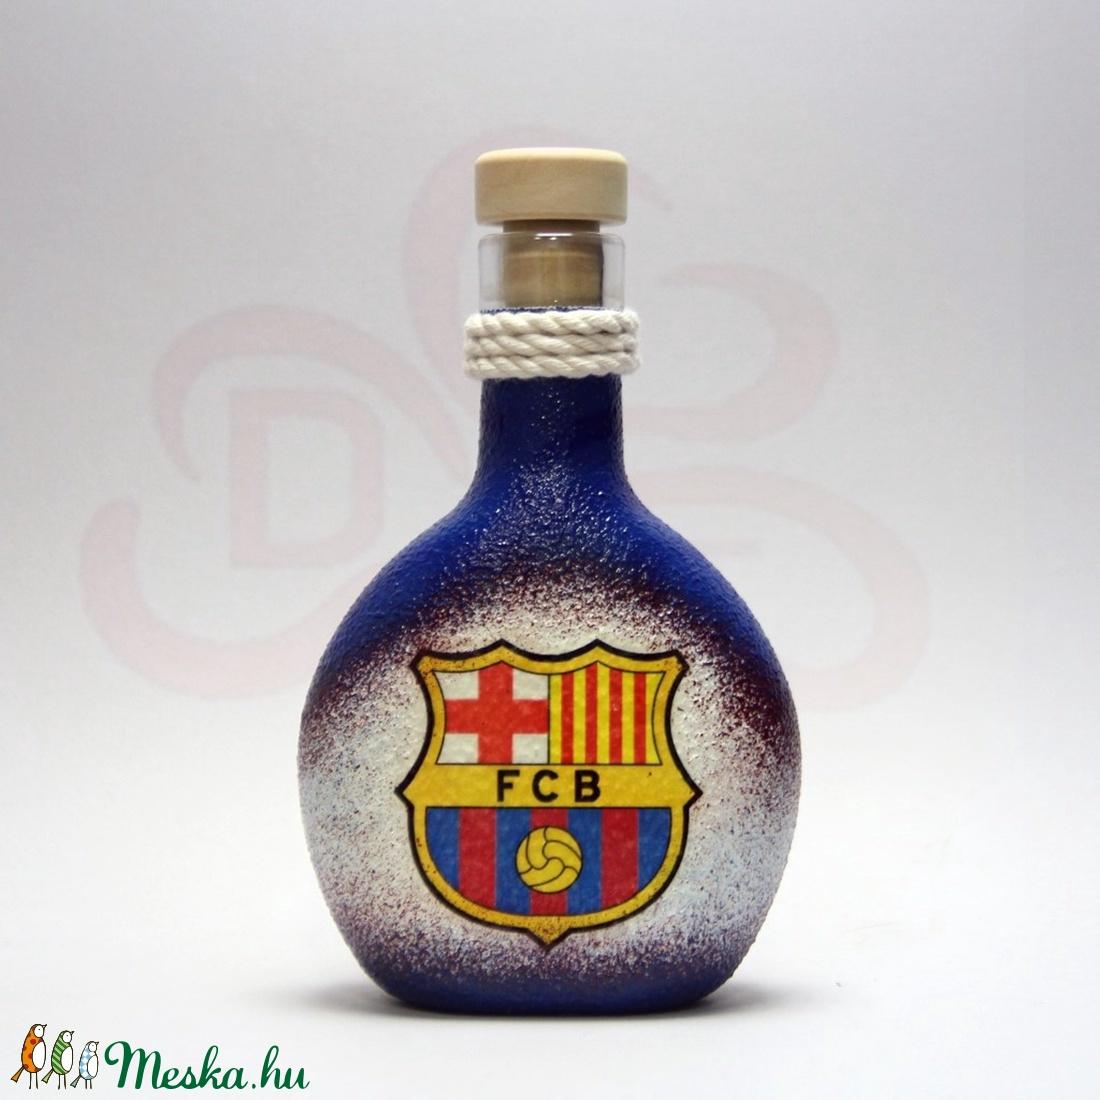 FC Barcelona italos üveg ; Barcelona foci szurkolóknak (decorfantasy) - Meska.hu